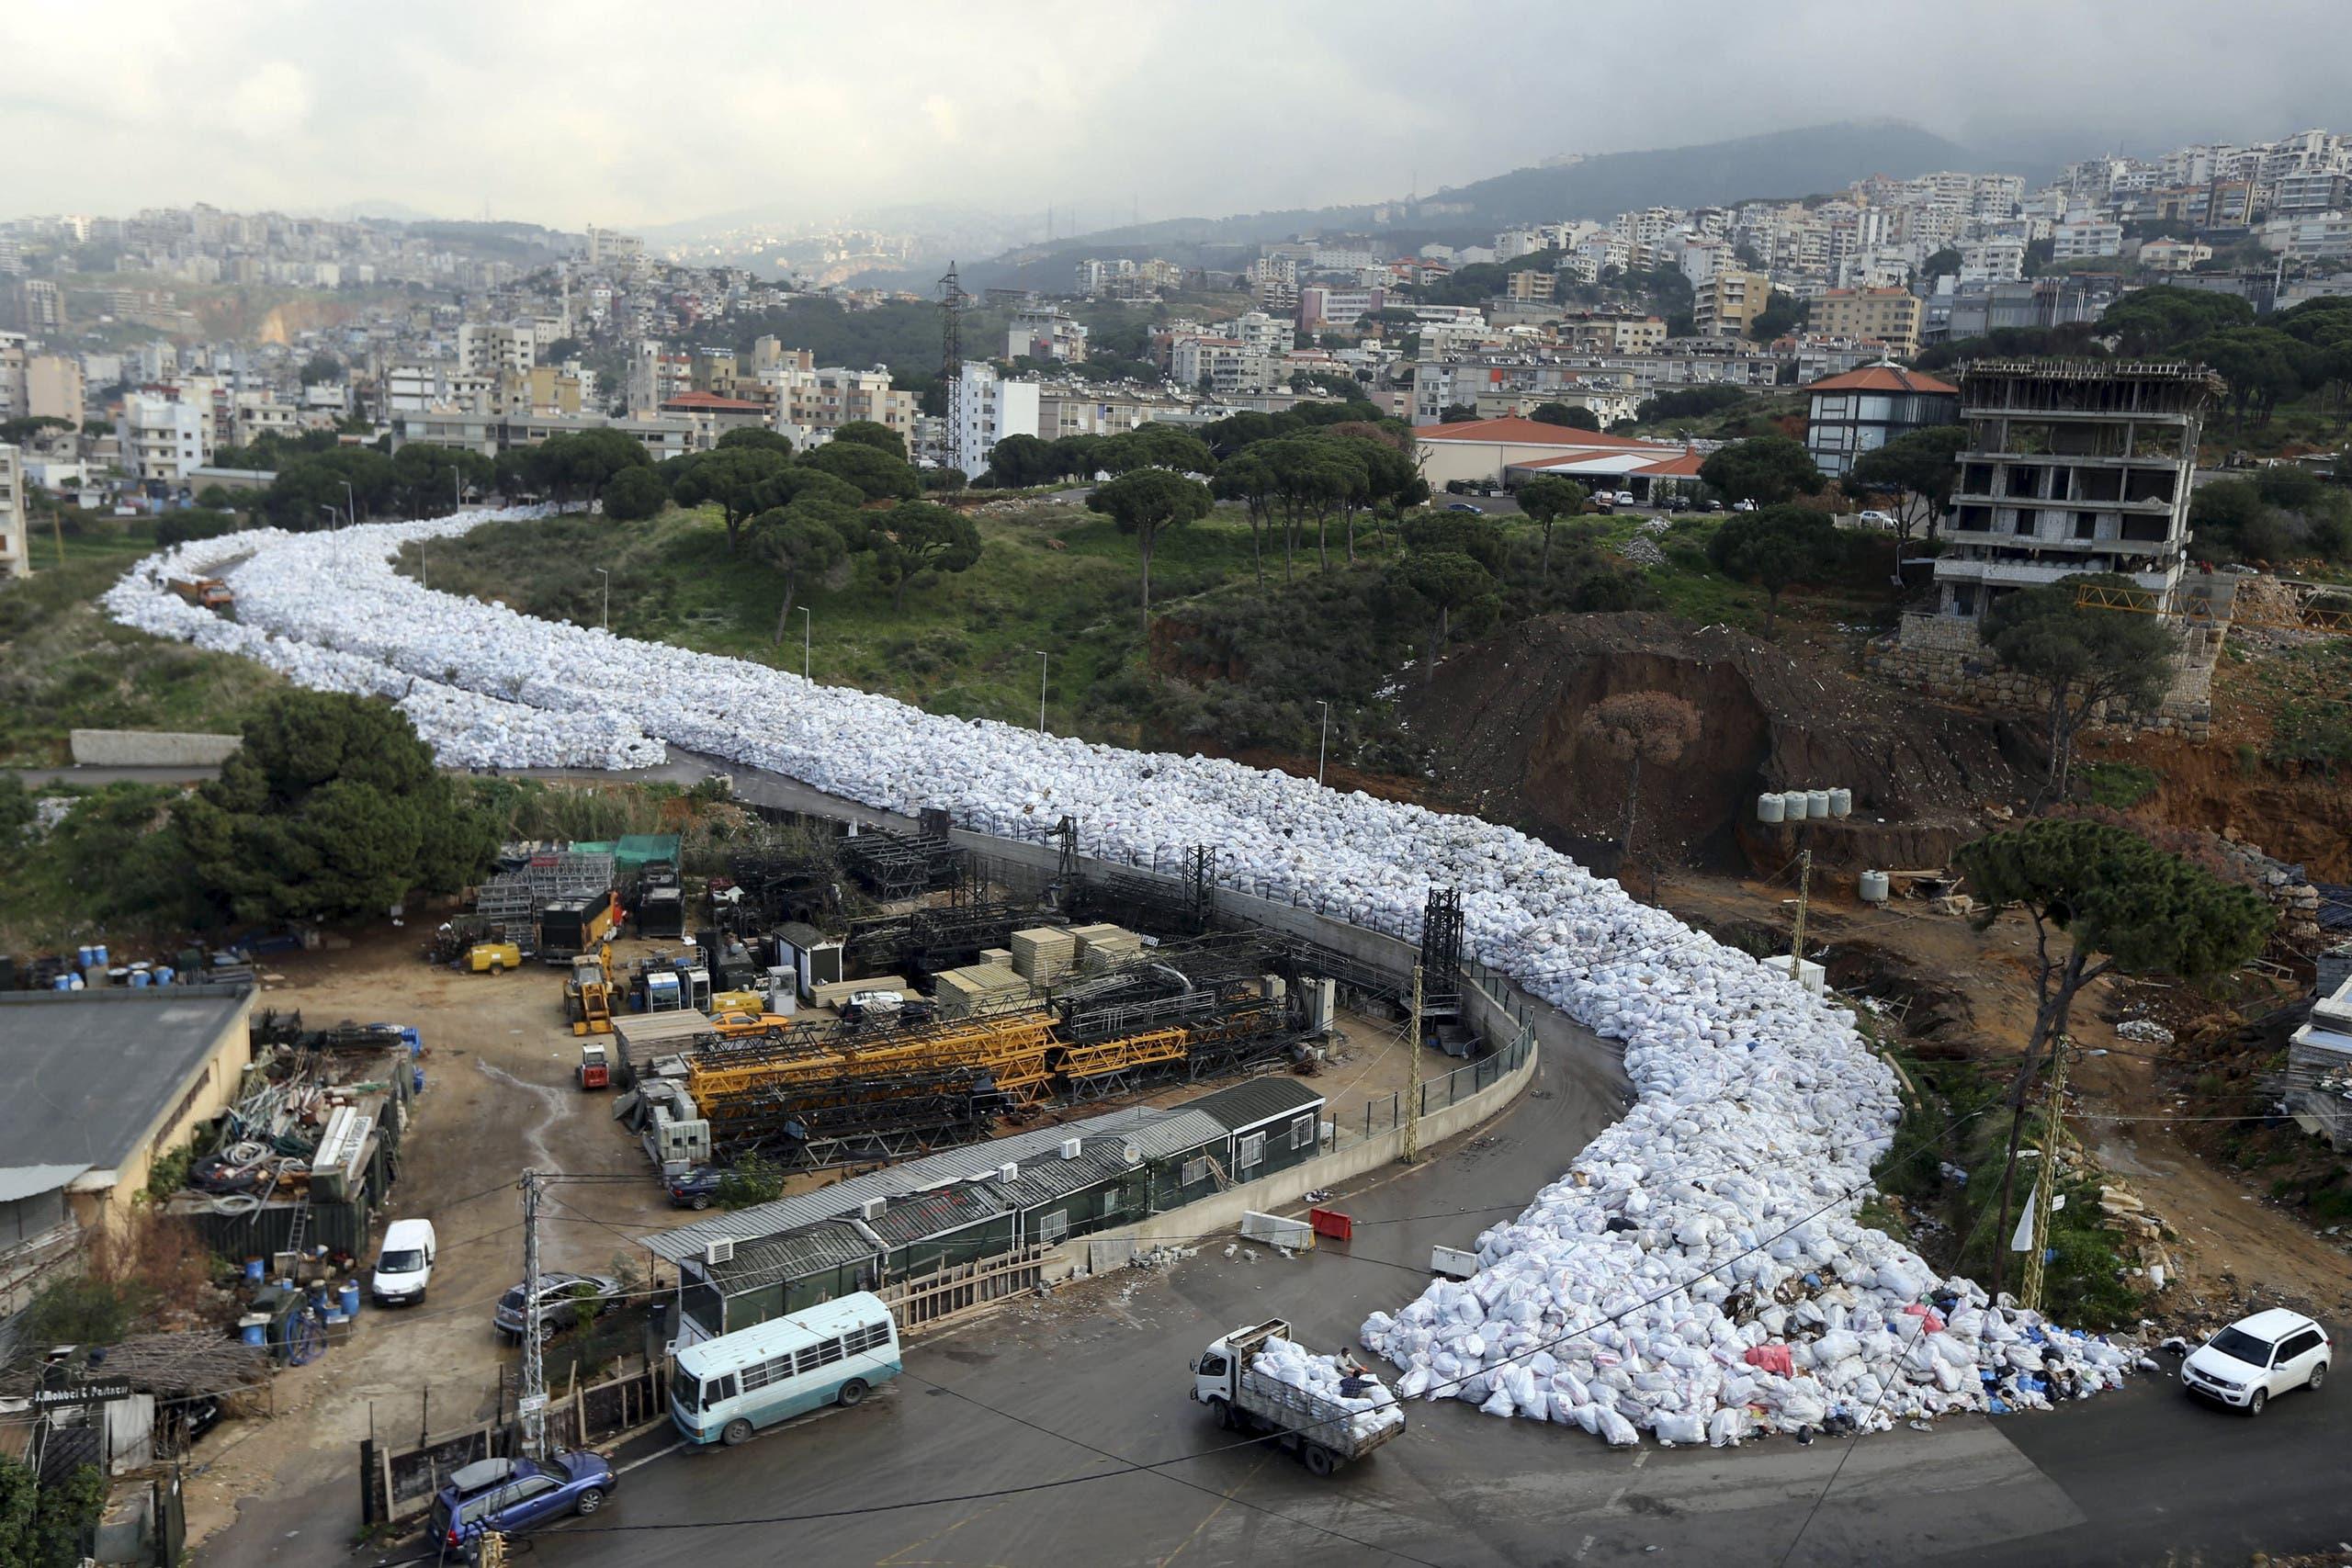 Lebanon's garbage overflow